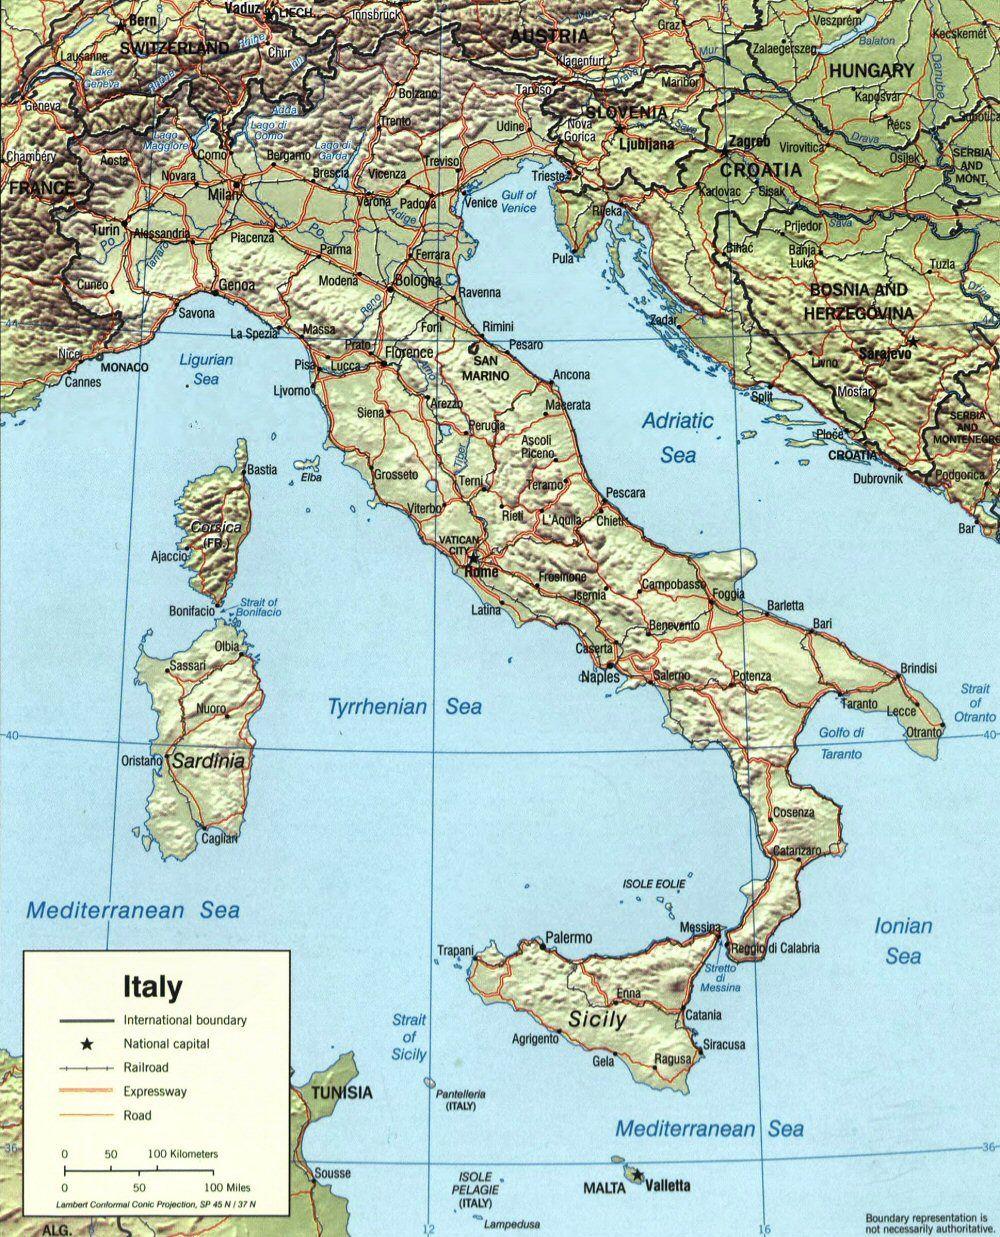 Carte de l'Italie (topographie). #TuscanyAgriturismoGiratola